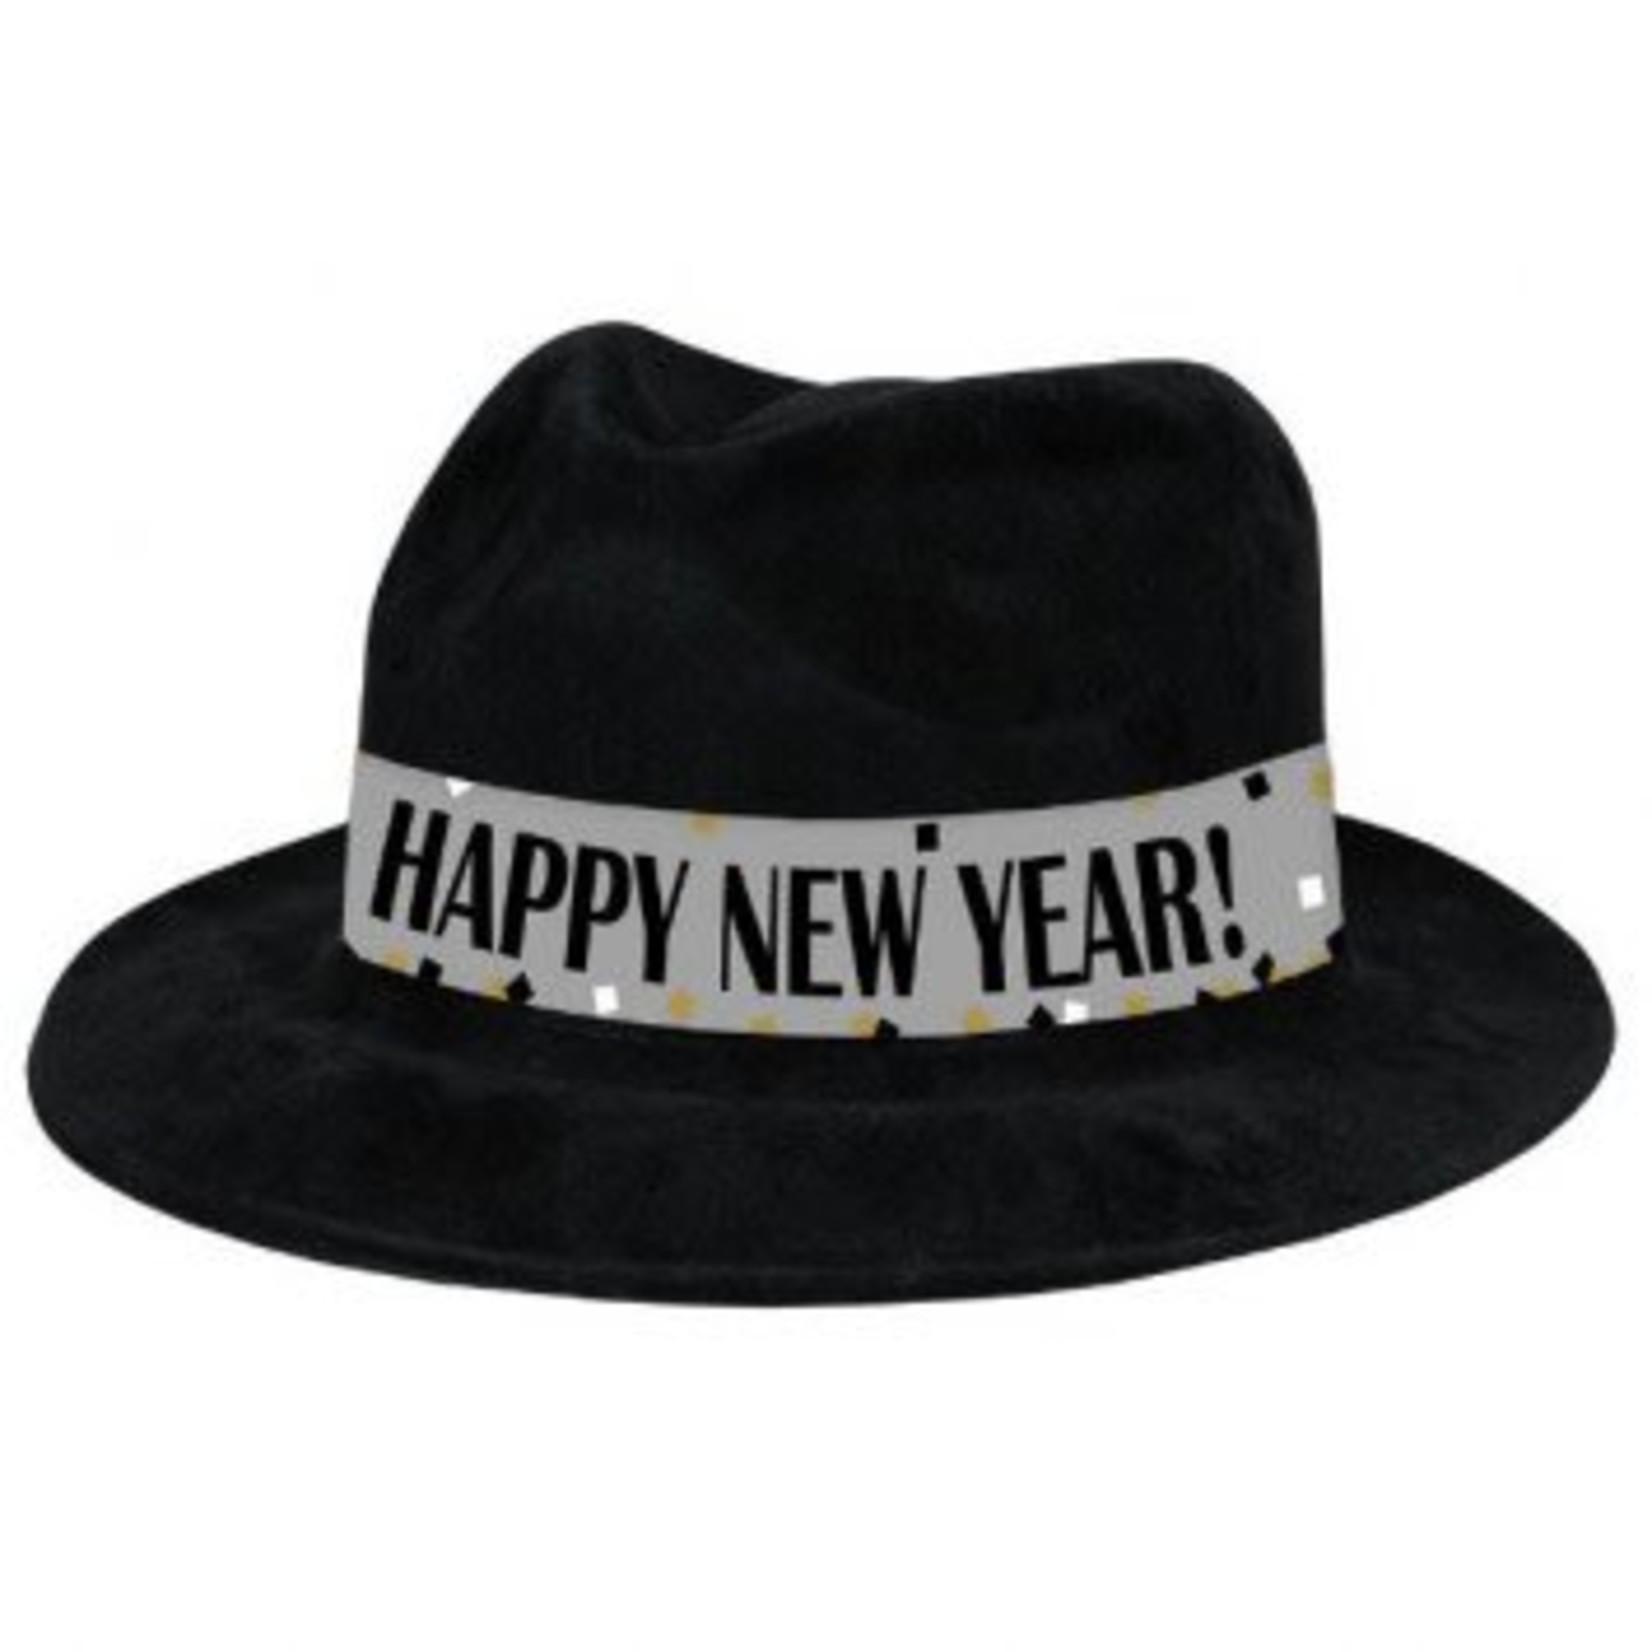 Amscan CHAPEAU FEDORA NOIR HAPPY NEW YEAR